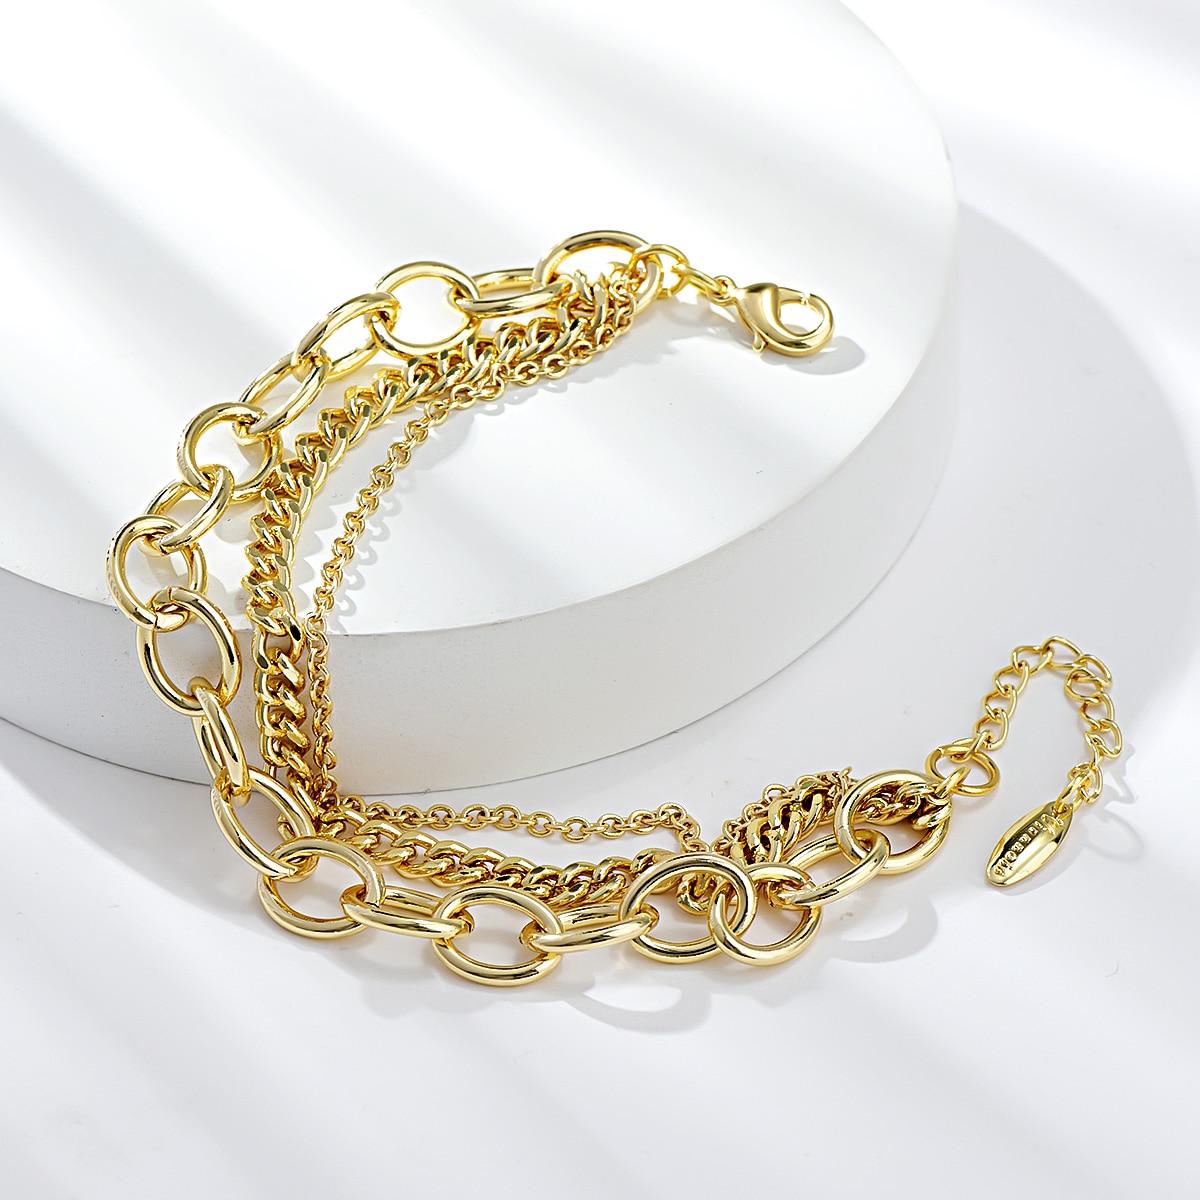 Viennois Dubai Style Simple Design Chain Bracelets & Bangles for Women Summer Beach Gift Wedding Gift Women Accessories